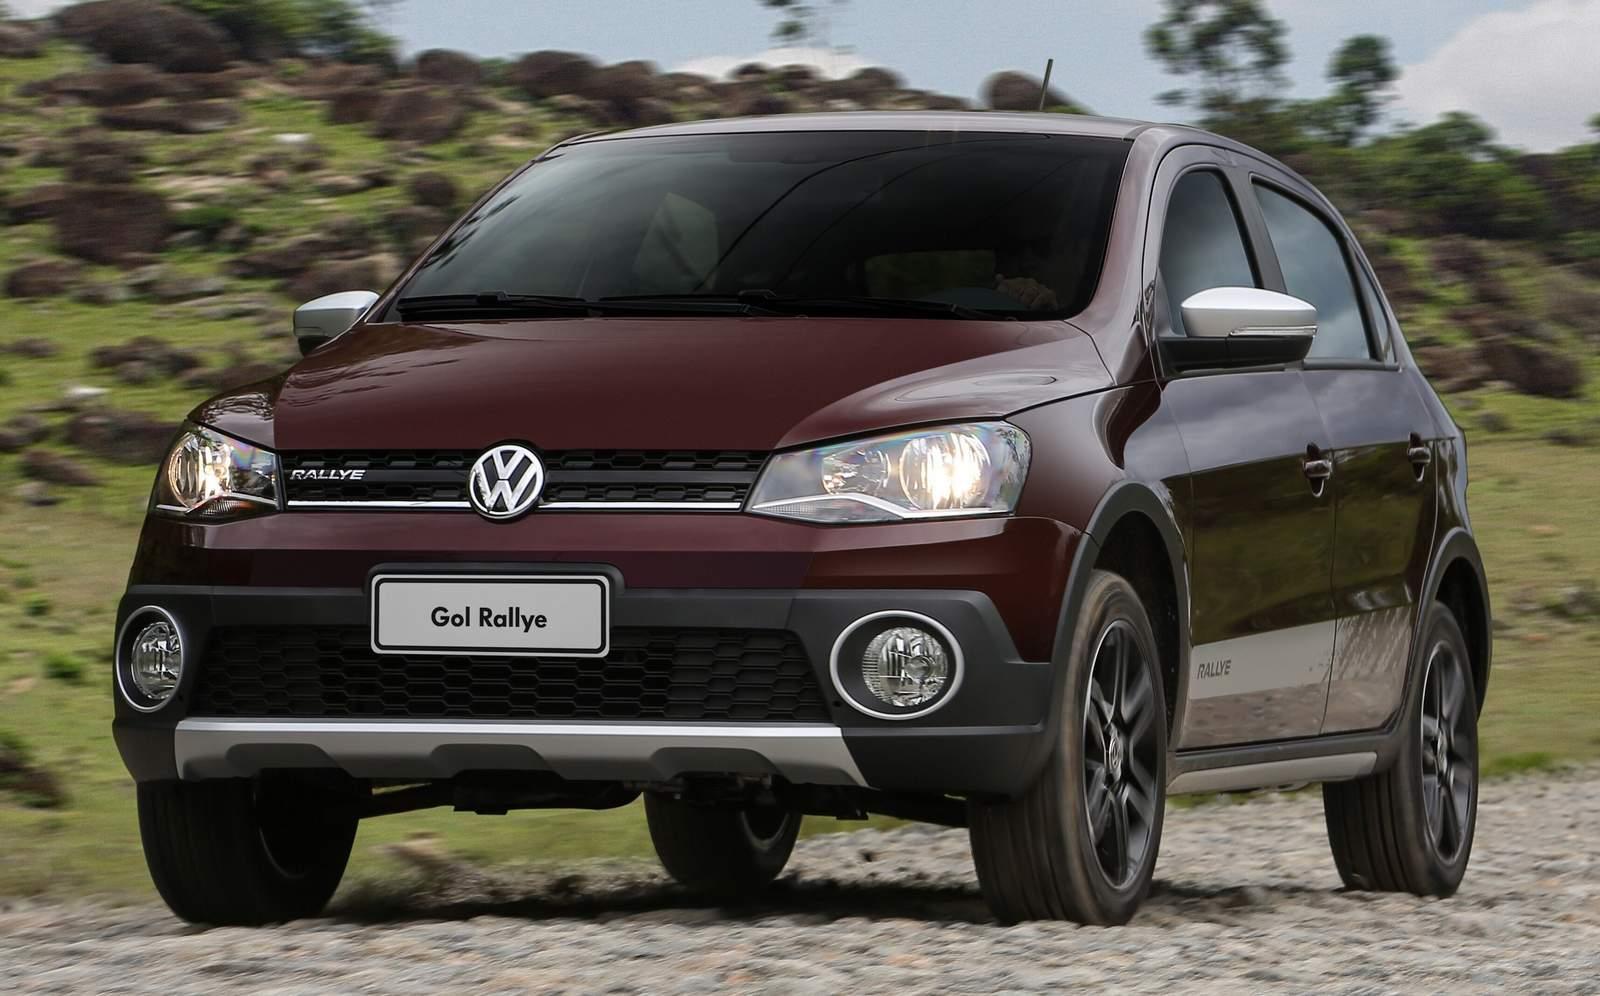 Novo Volkswagen Gol G6 2015 - Rallye